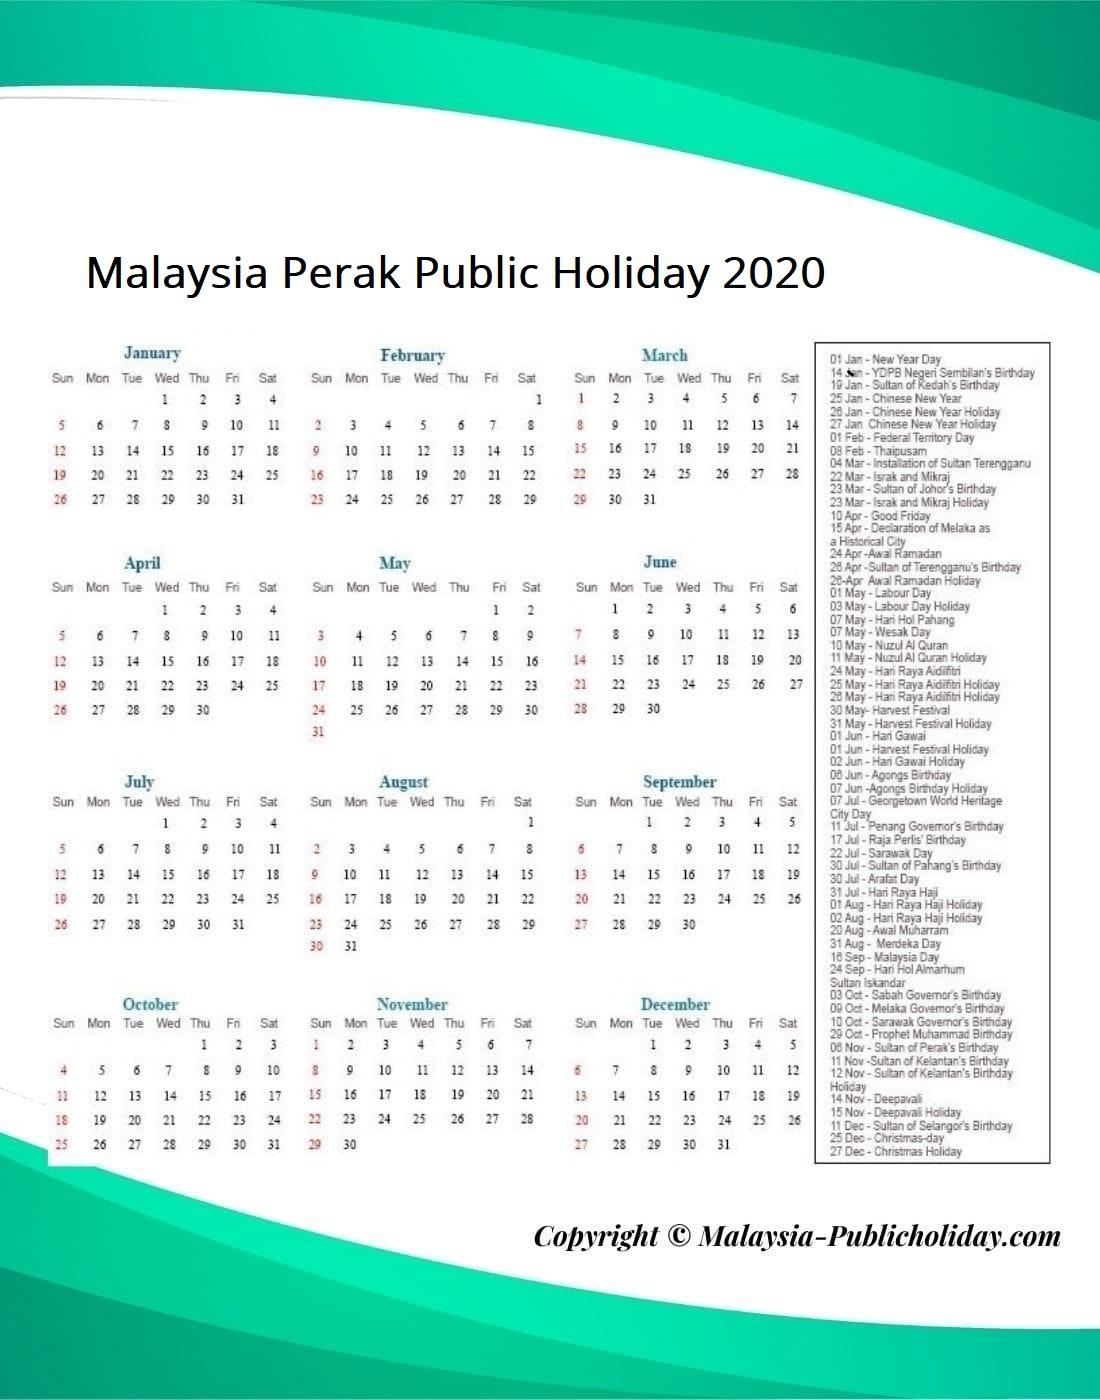 Perak Public Holiday 2020